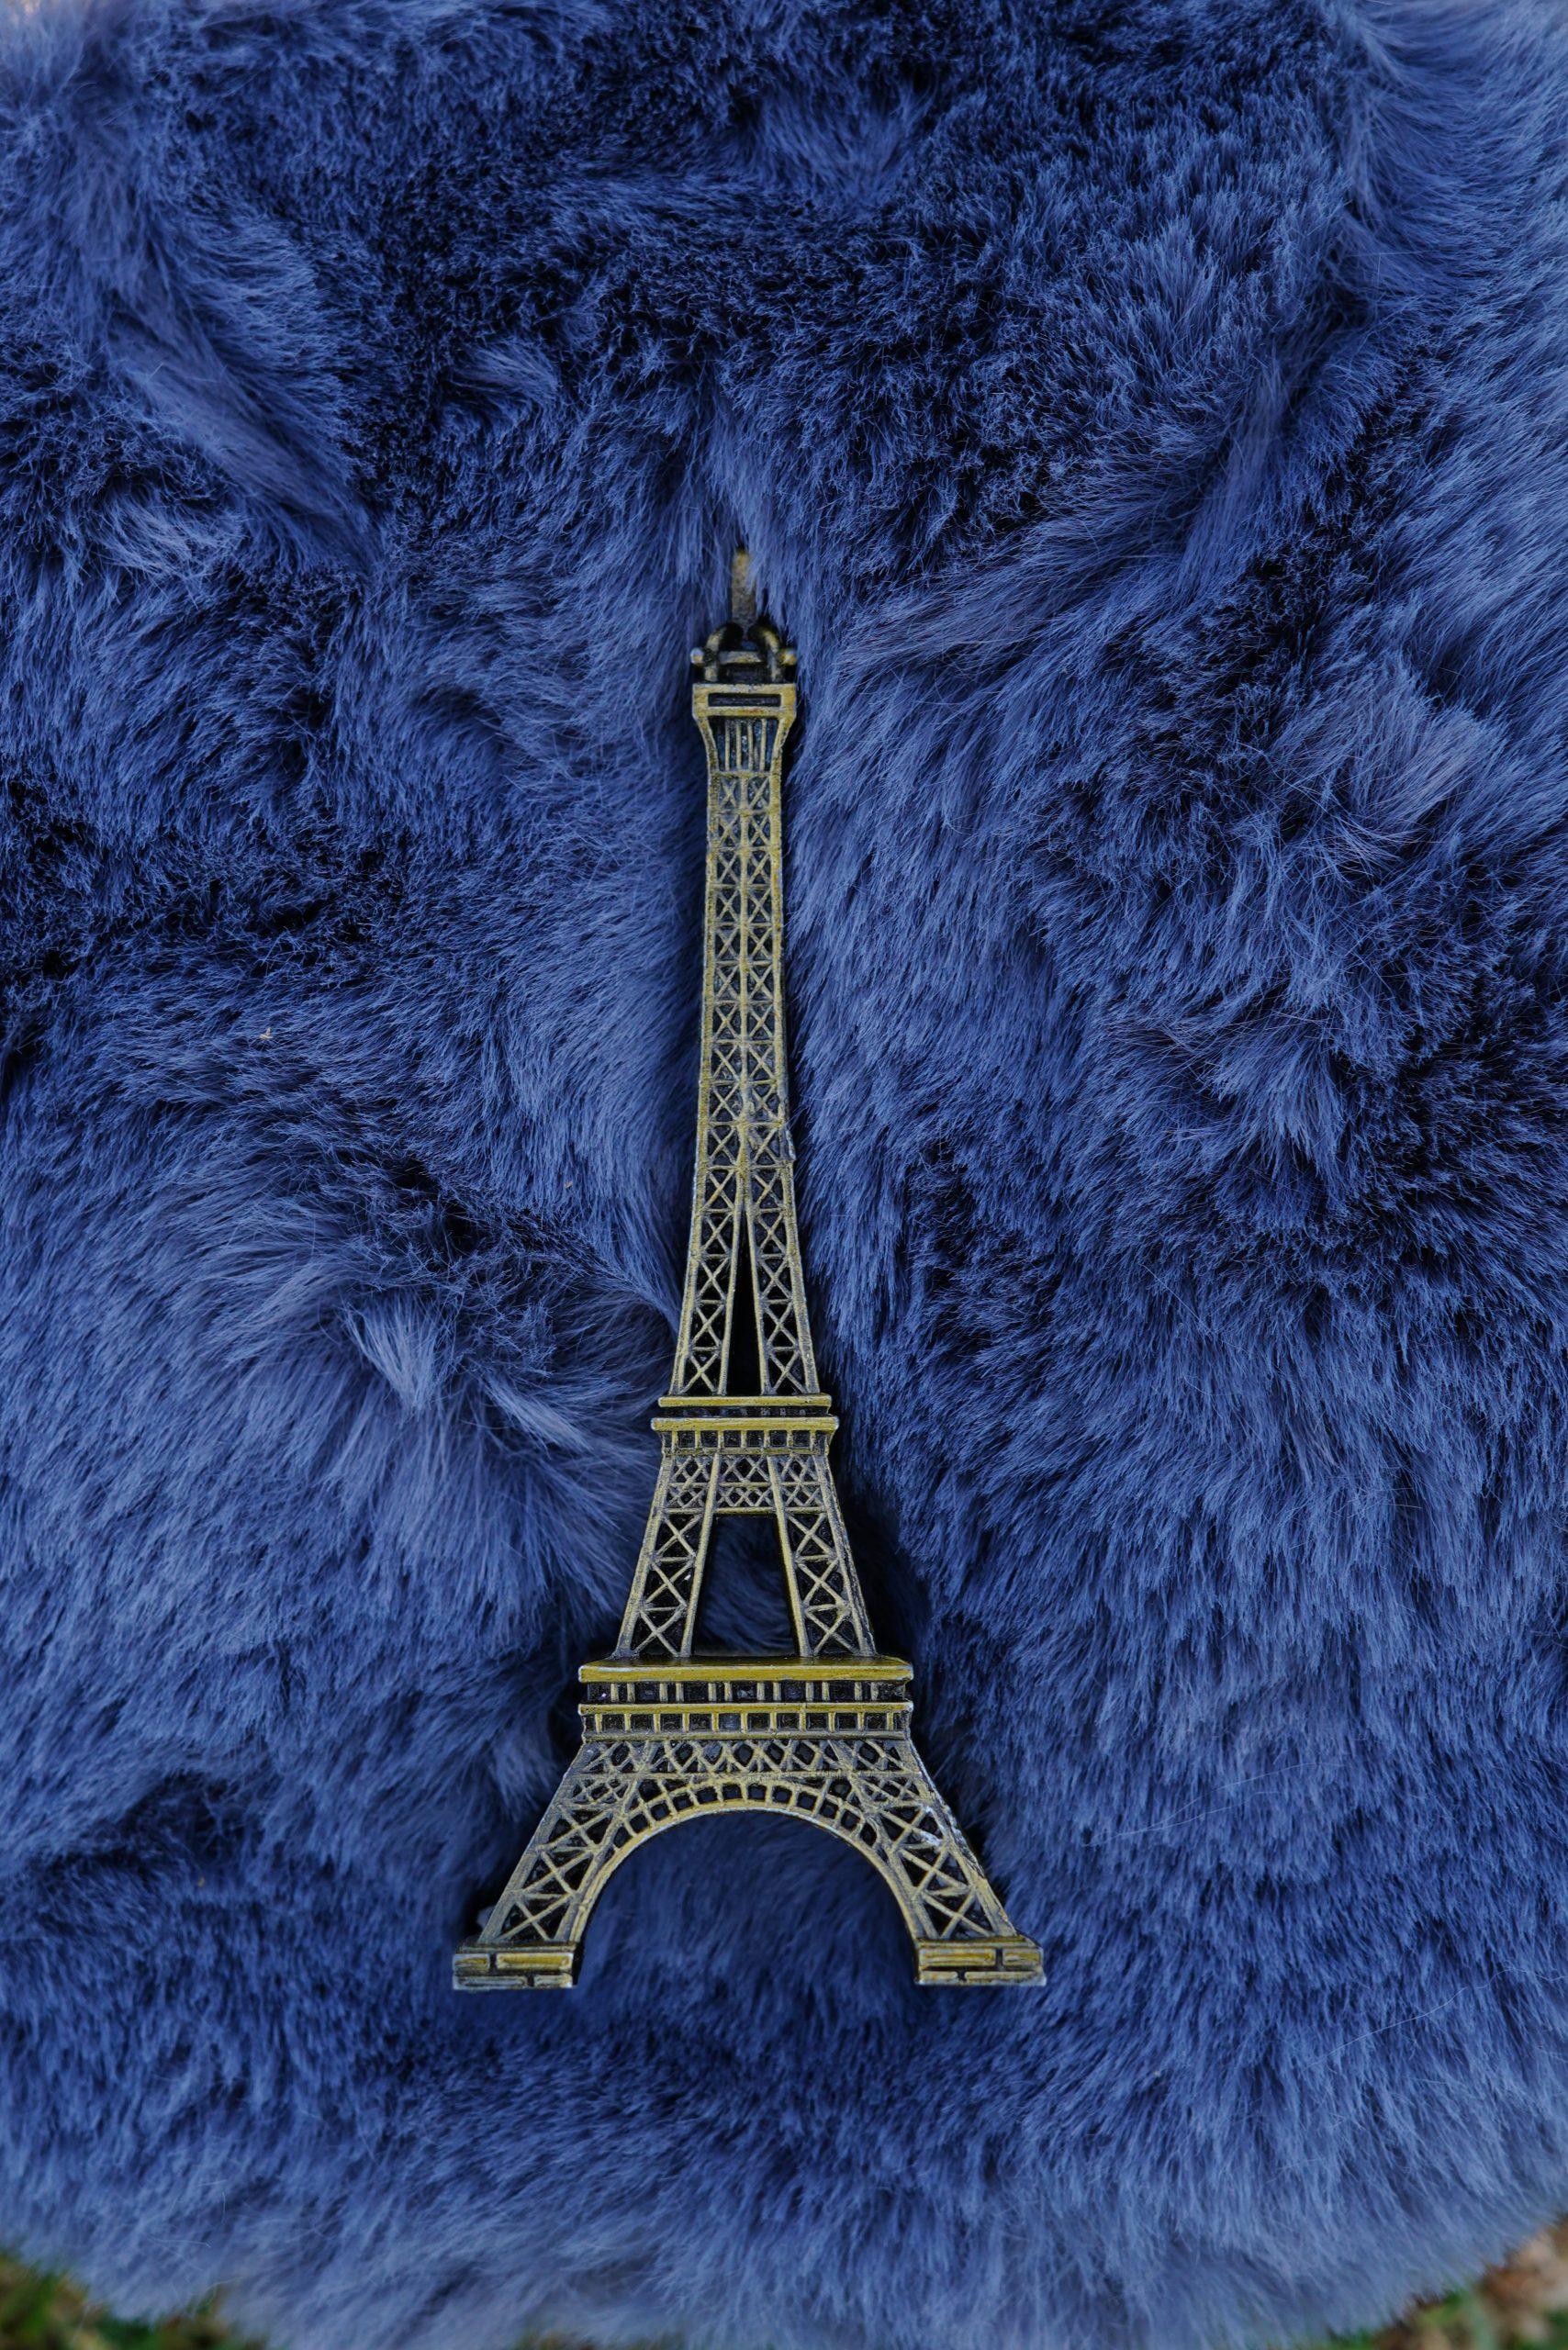 Eiffel tower toy on a woolen